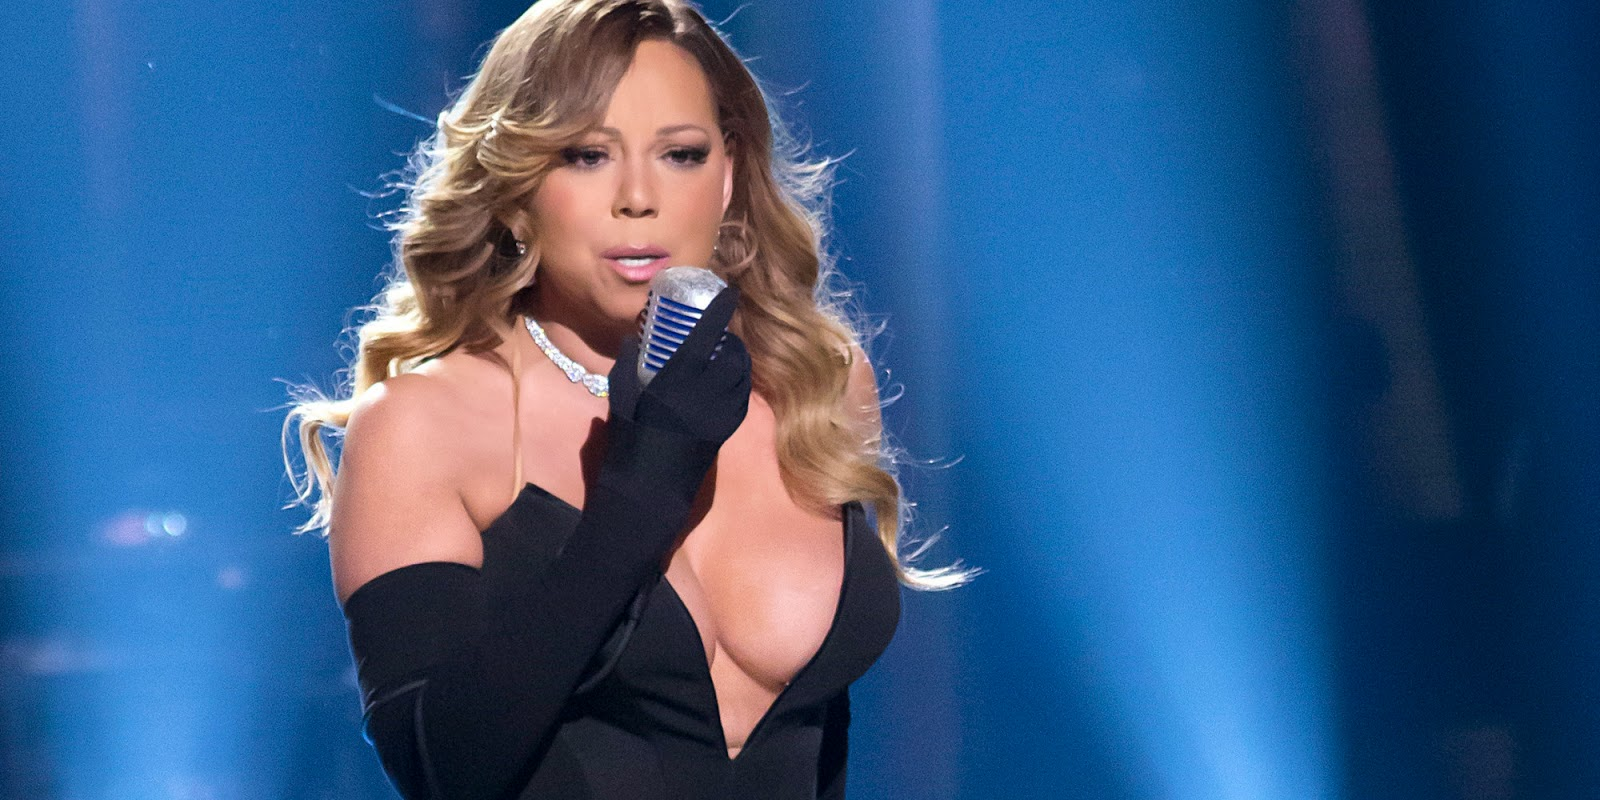 Mariah Carey Yang Bikin Panas Ketika Konsert